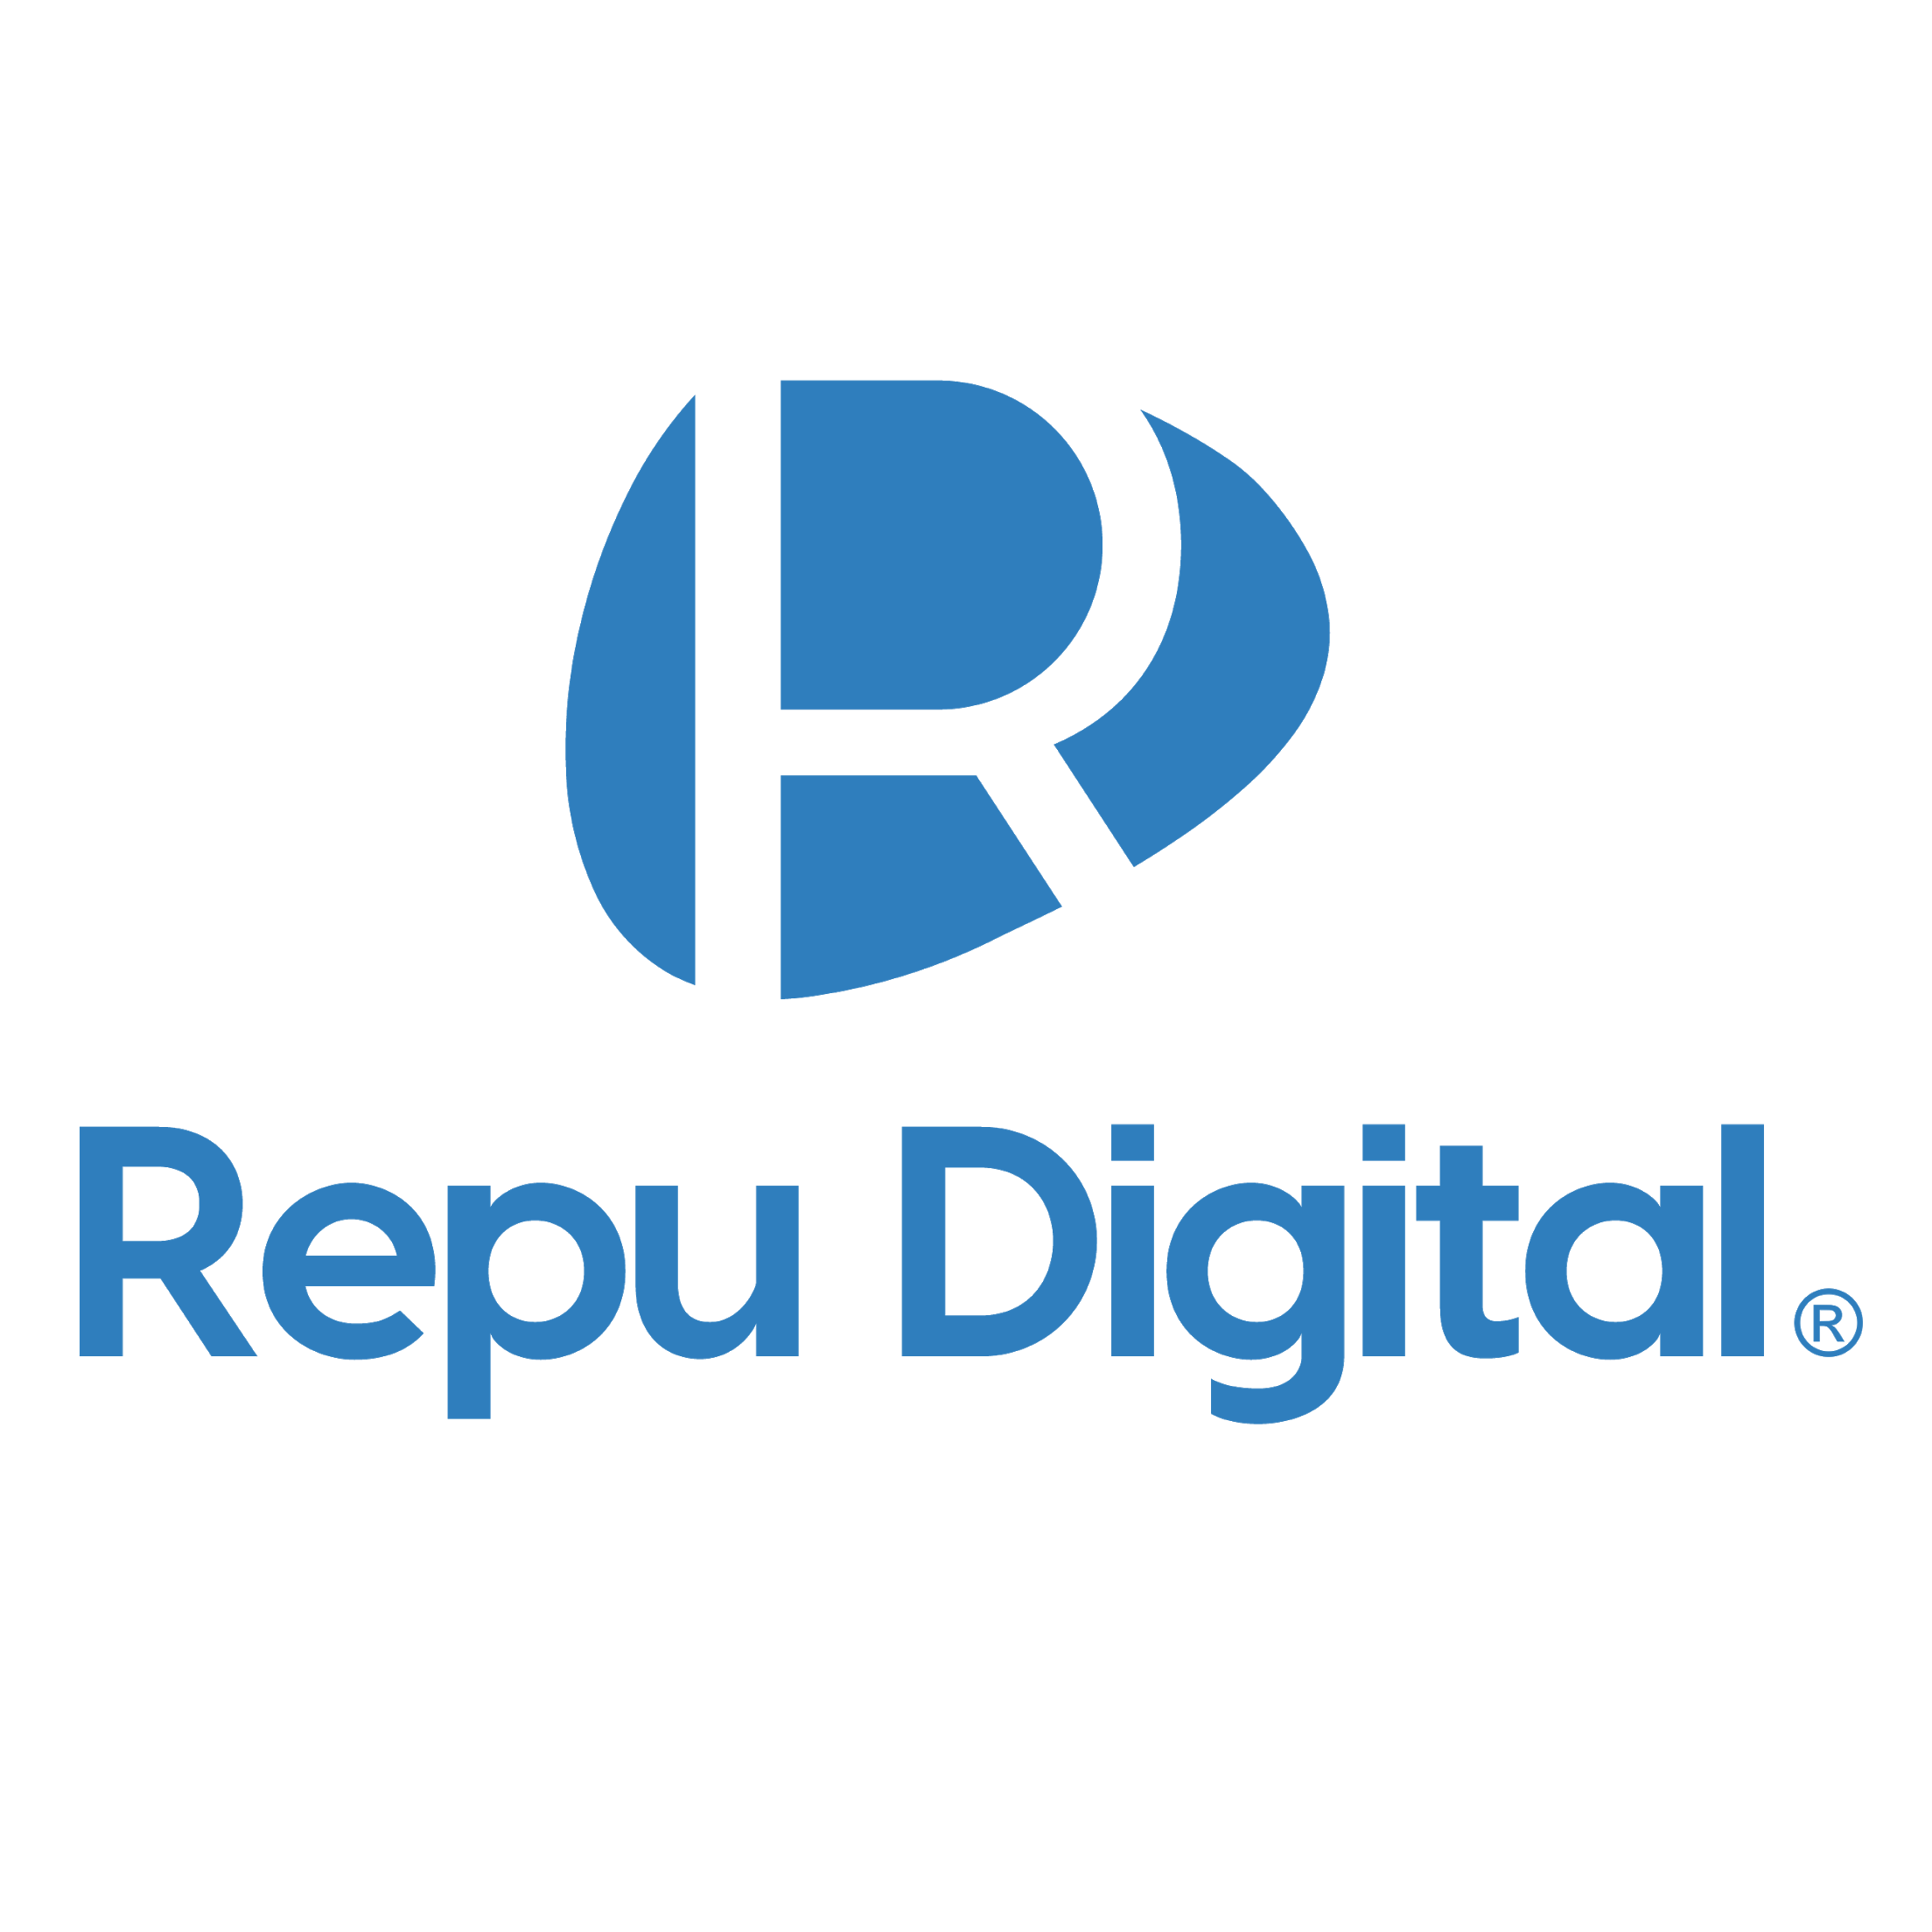 Repu Digital logo